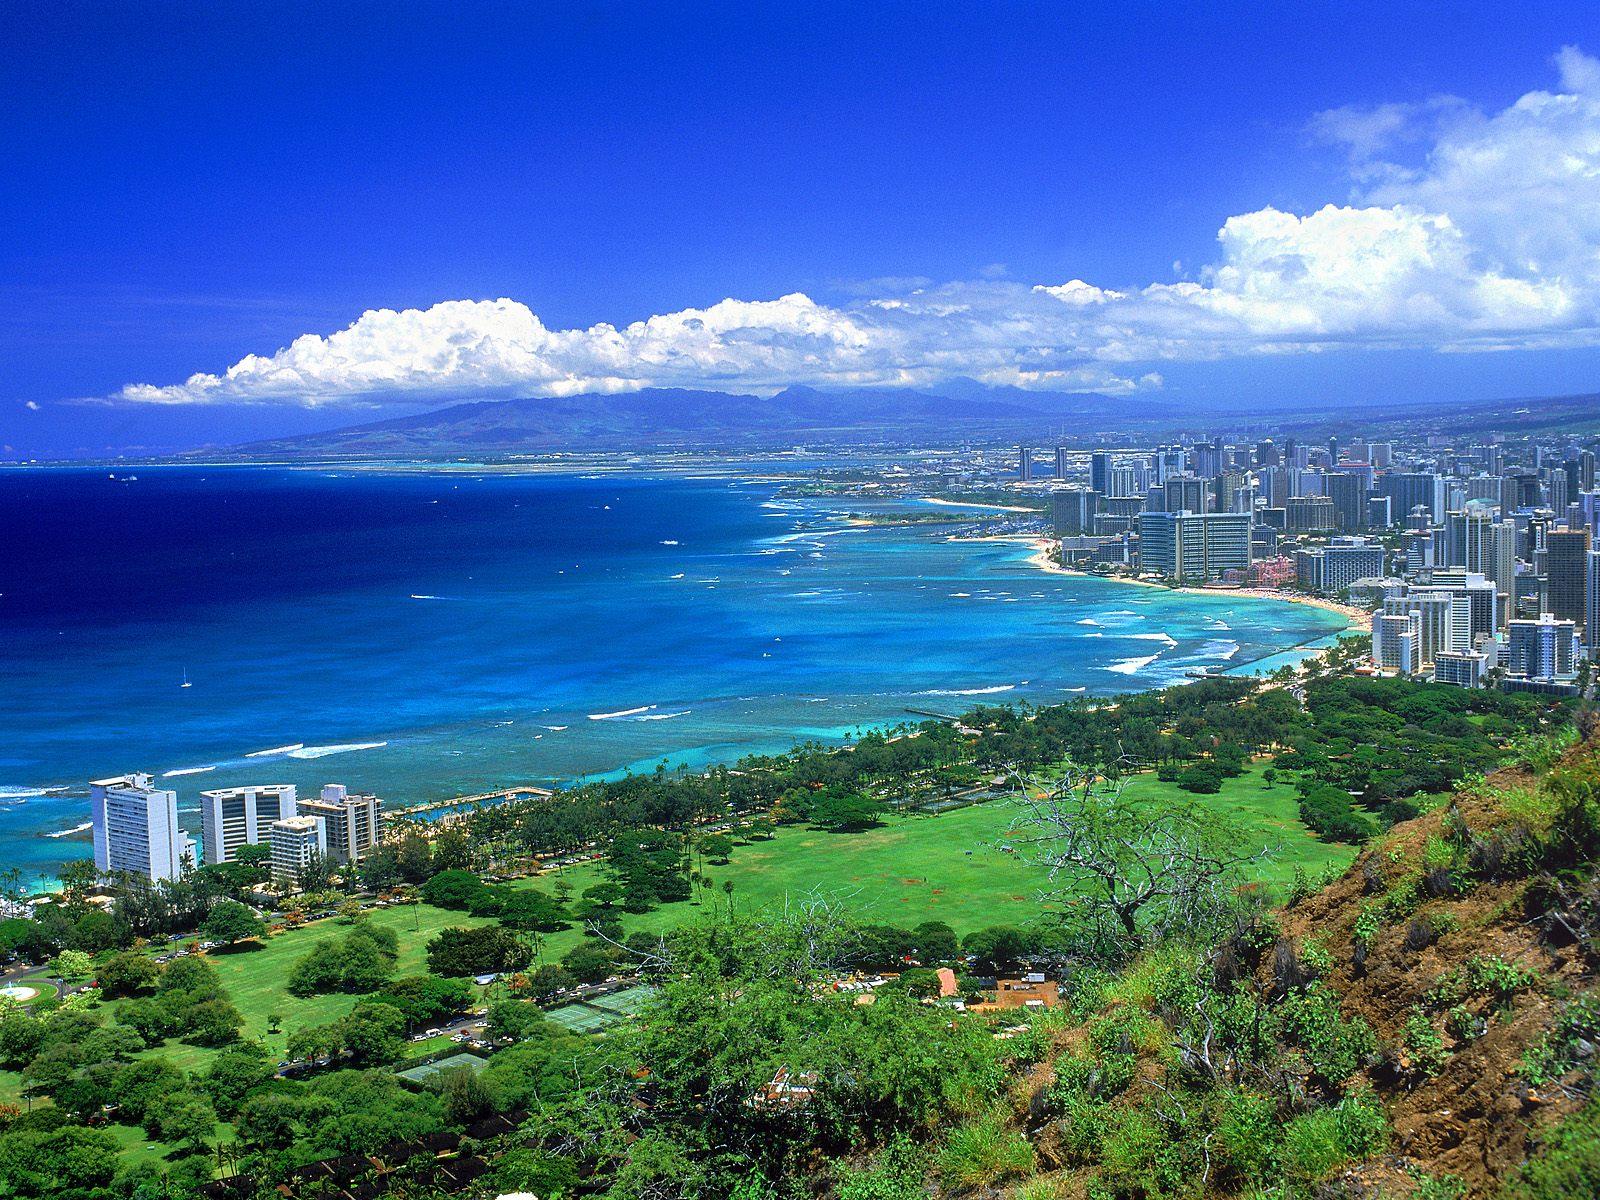 http://4.bp.blogspot.com/_2IU2Nt4rD1k/S73LkRcbS0I/AAAAAAAABXY/m8HgzQFsrEA/s1600/Diamond+Head+Oahu+Hawaii.jpg